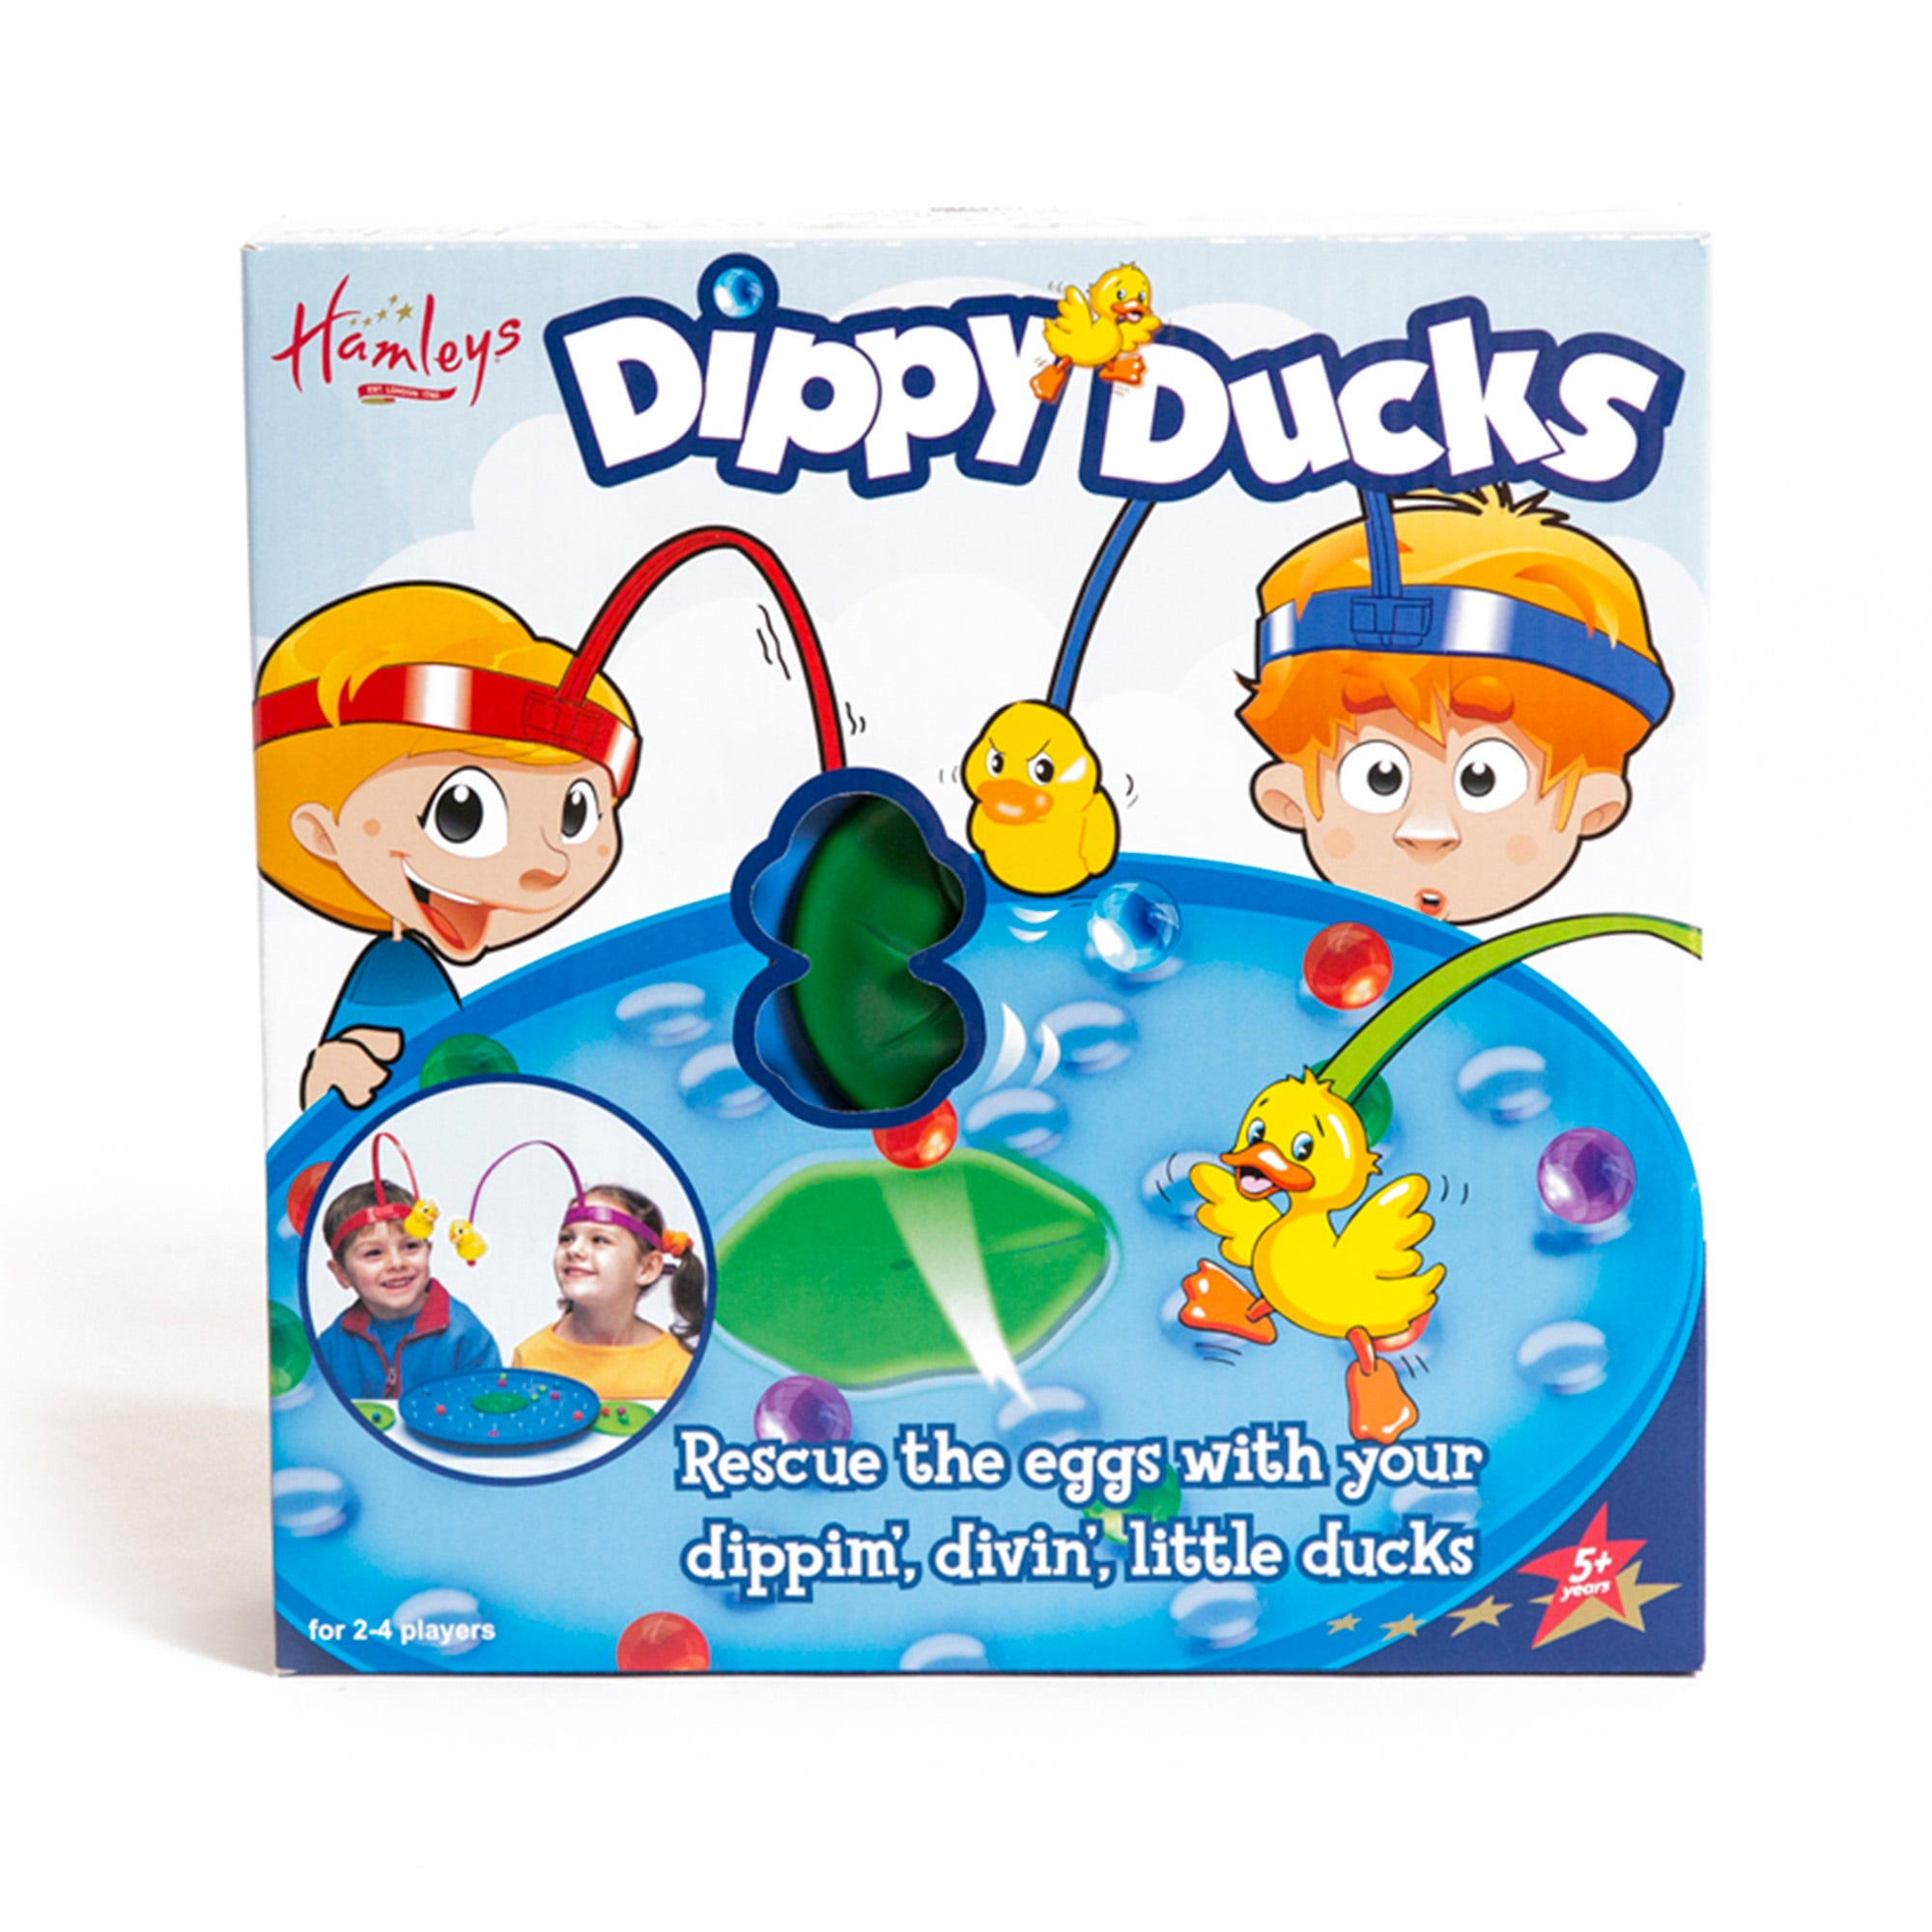 Hamleys DIPPY DUCKS